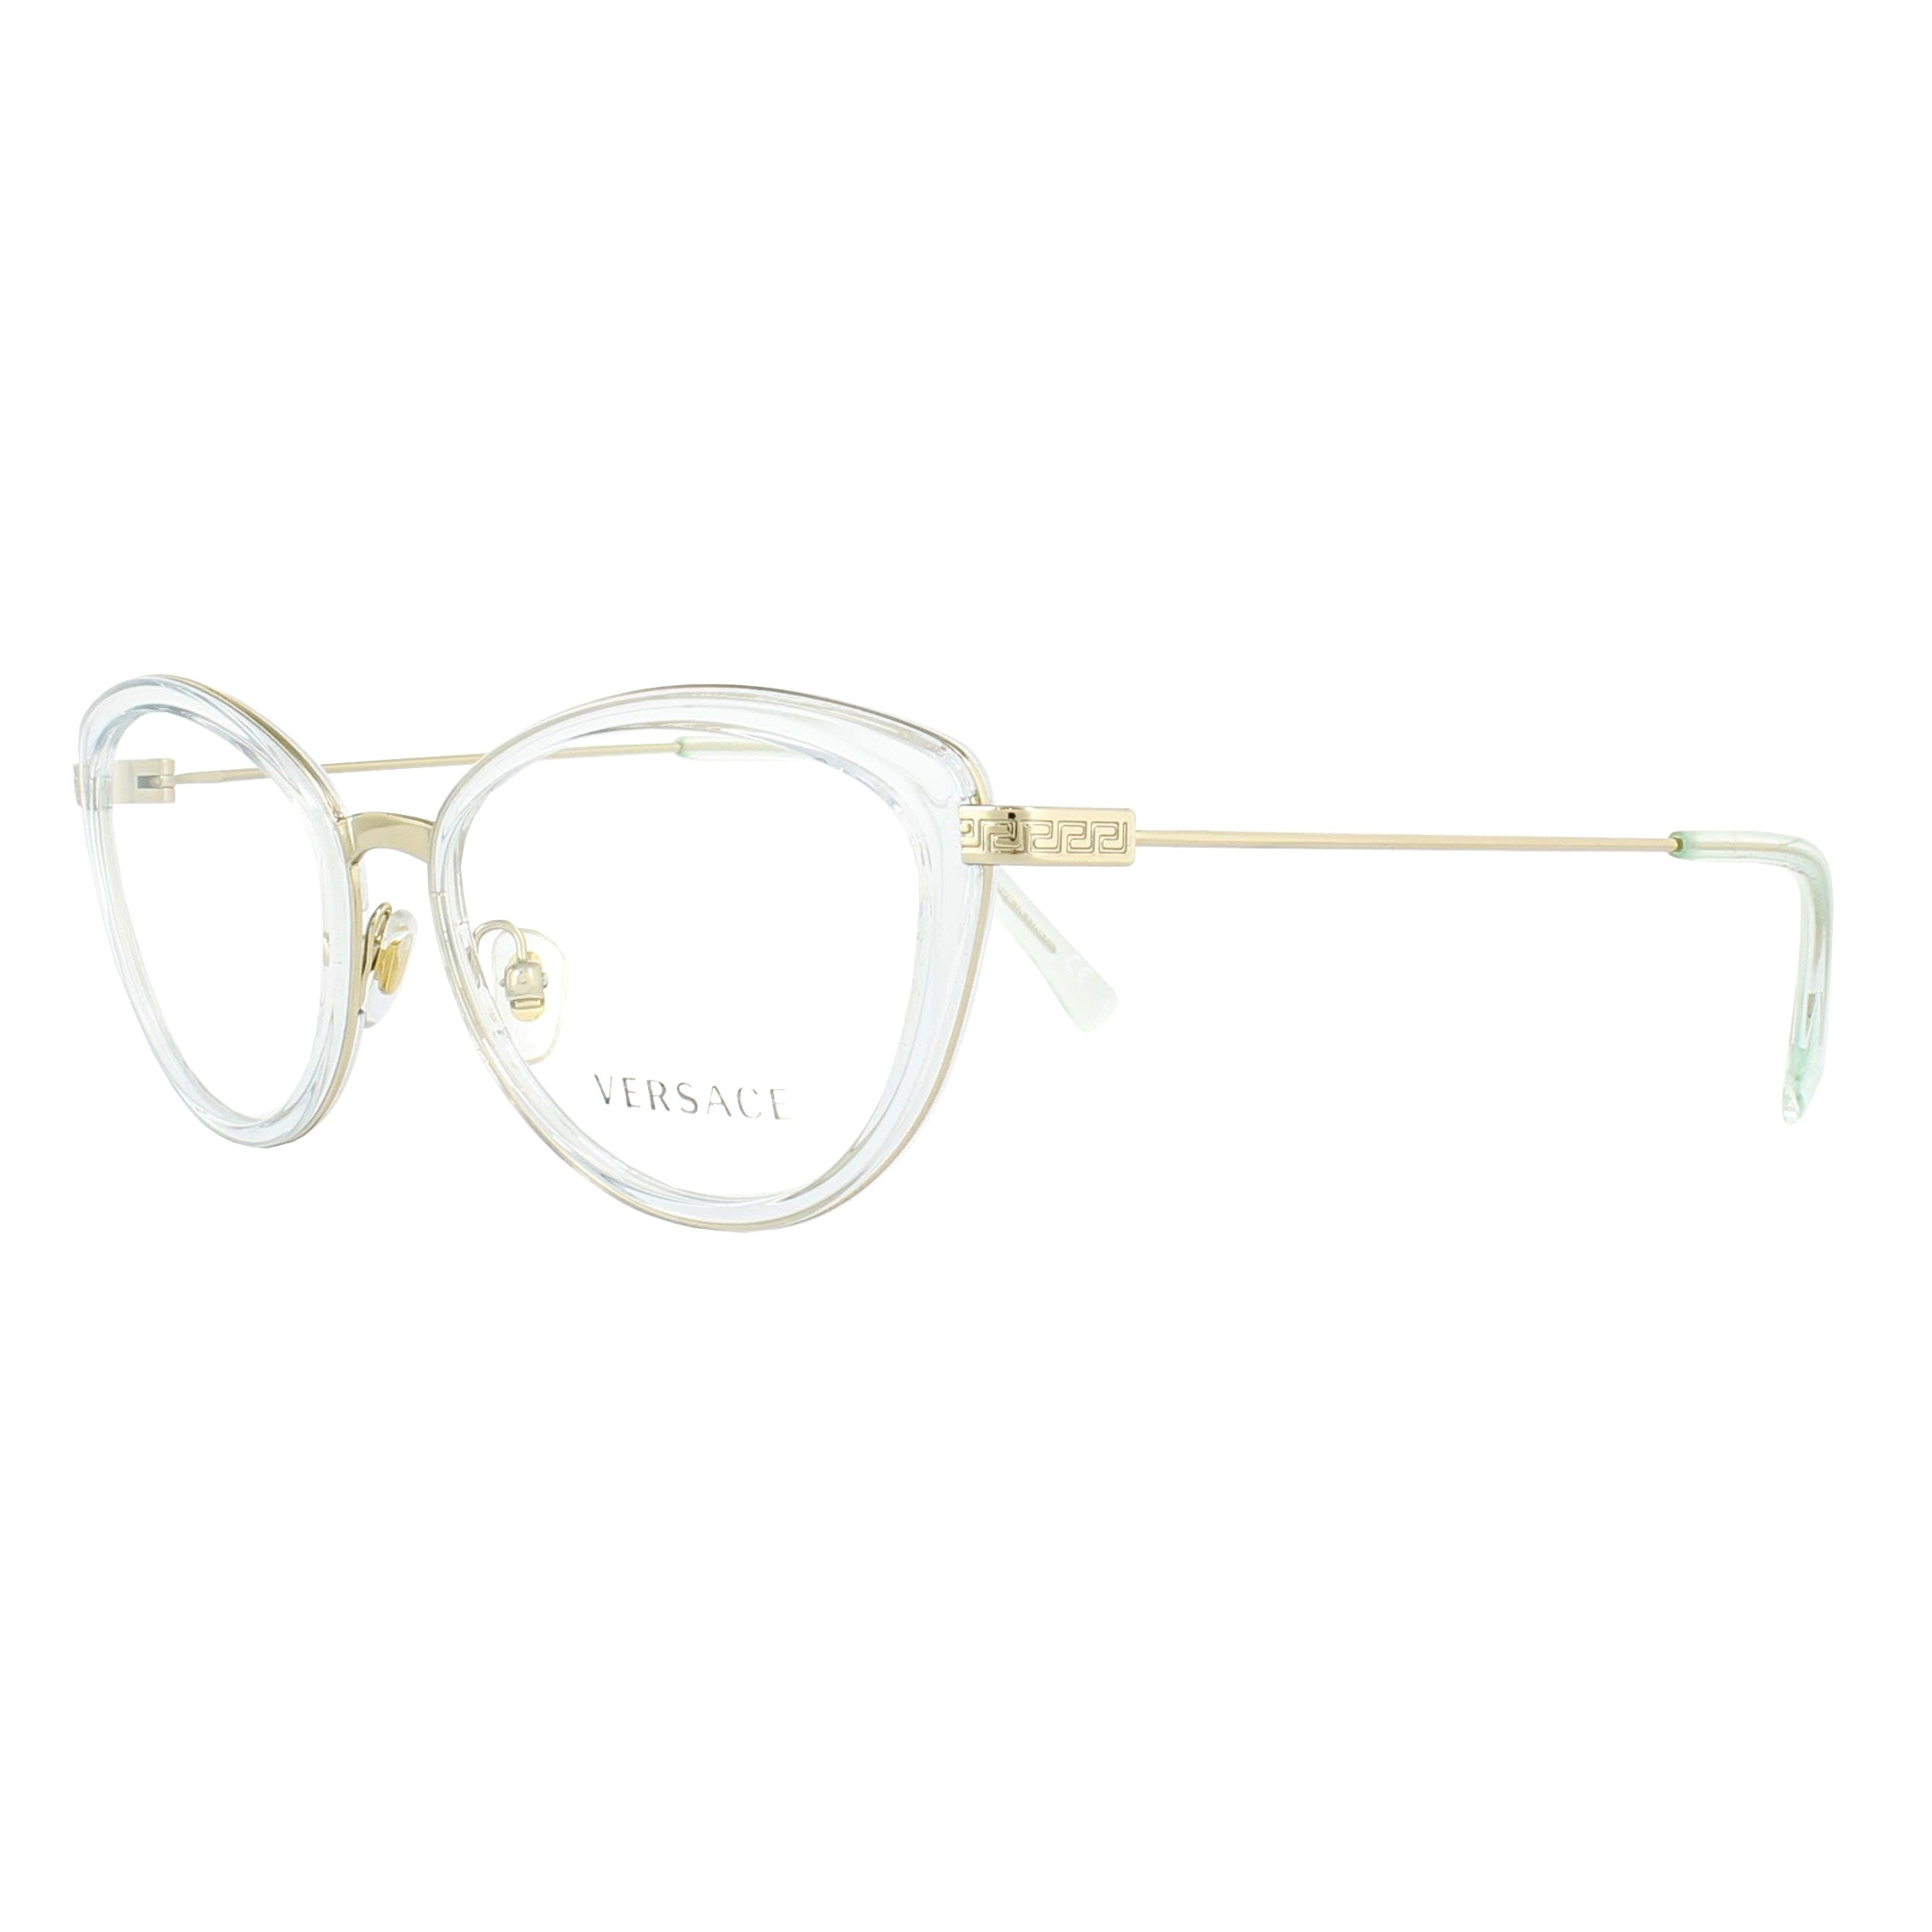 55b60f1a4d Sentinel Versace Glasses Frames 1244 1405 Light Blue Transparent   Pale  Gold 53mm Womens